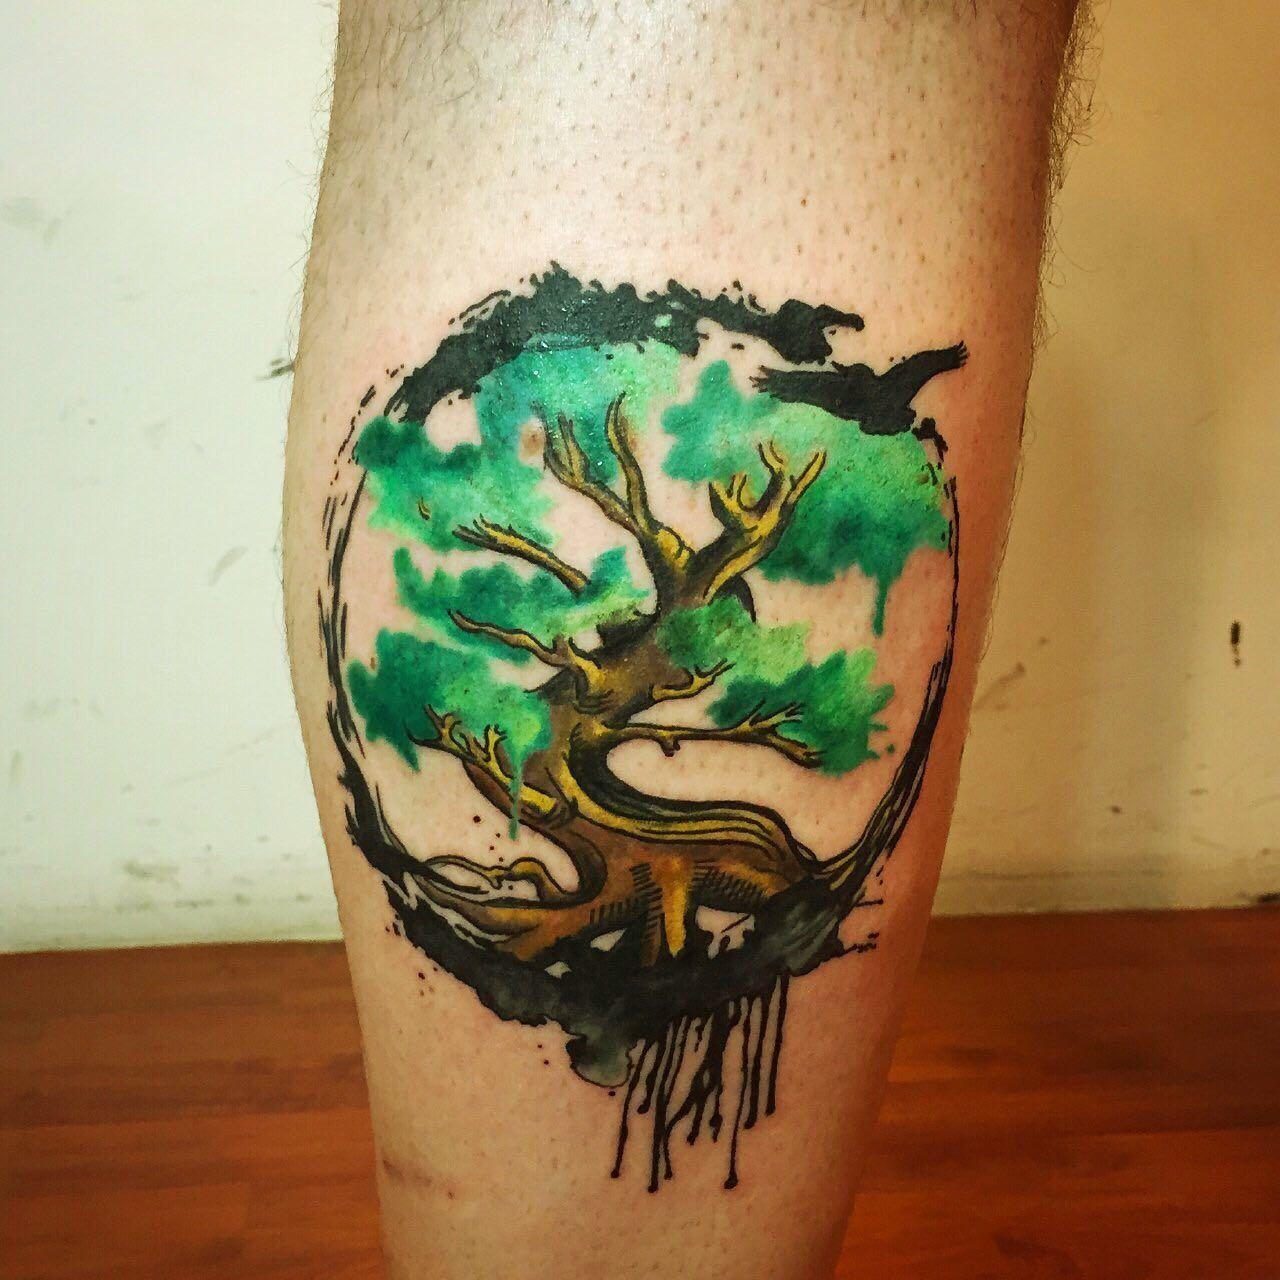 Yggdrasil Tattoo By Yeliz Özcan @ Galata Tattoo - İstanbul ...